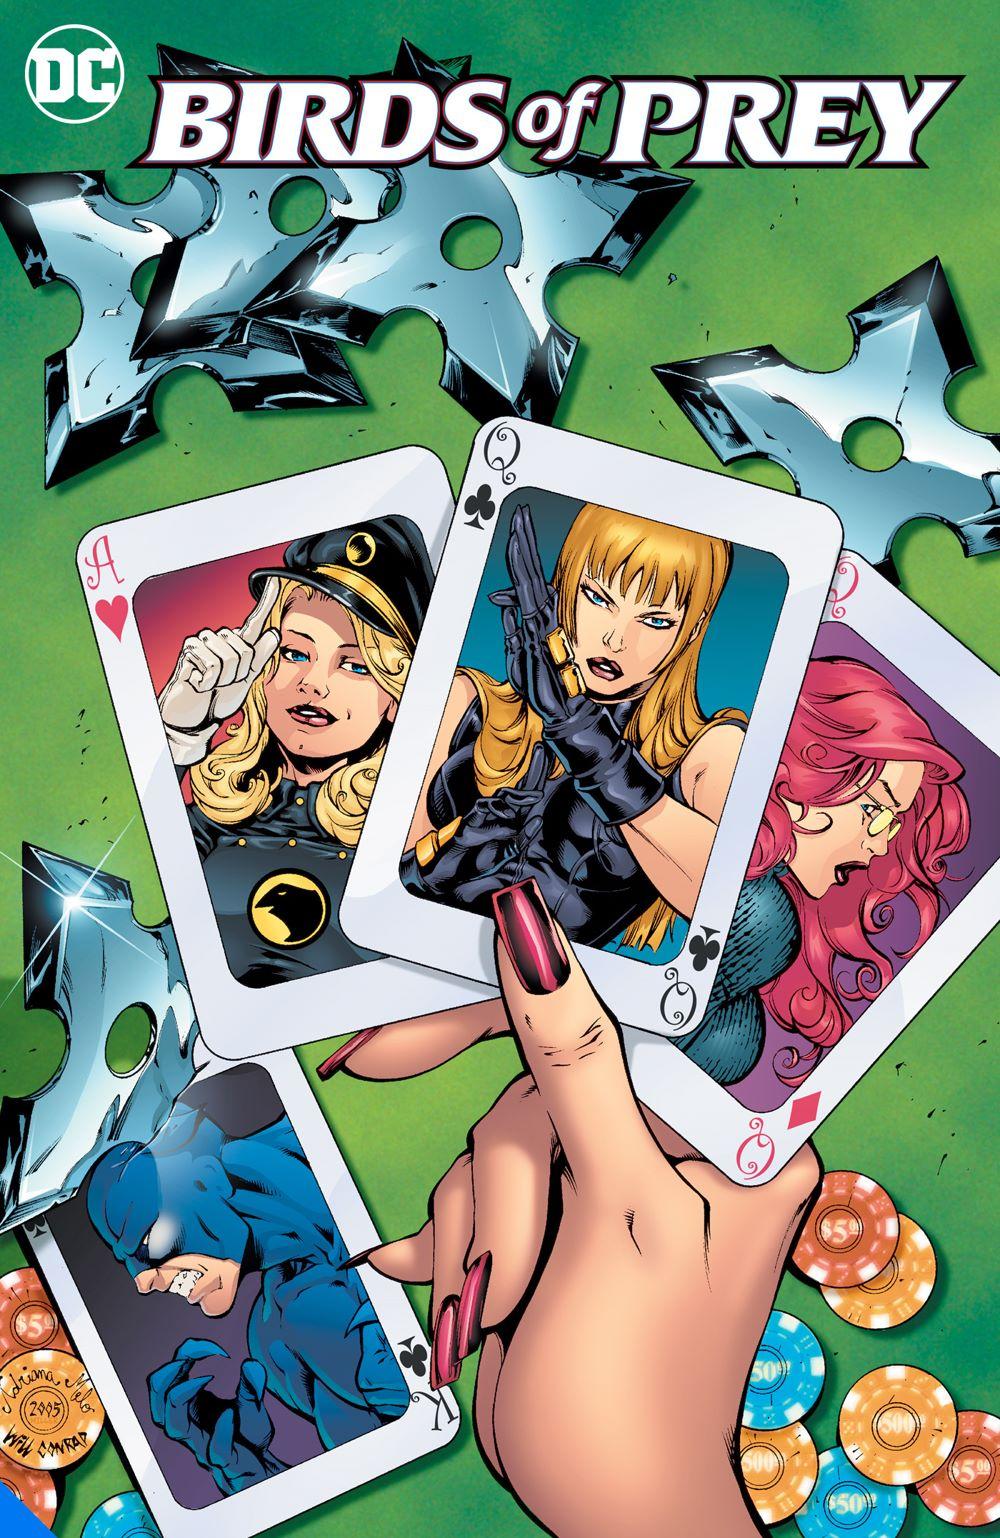 birdsofpreyfightersbytrade_adv DC Comics August 2021 Solicitations